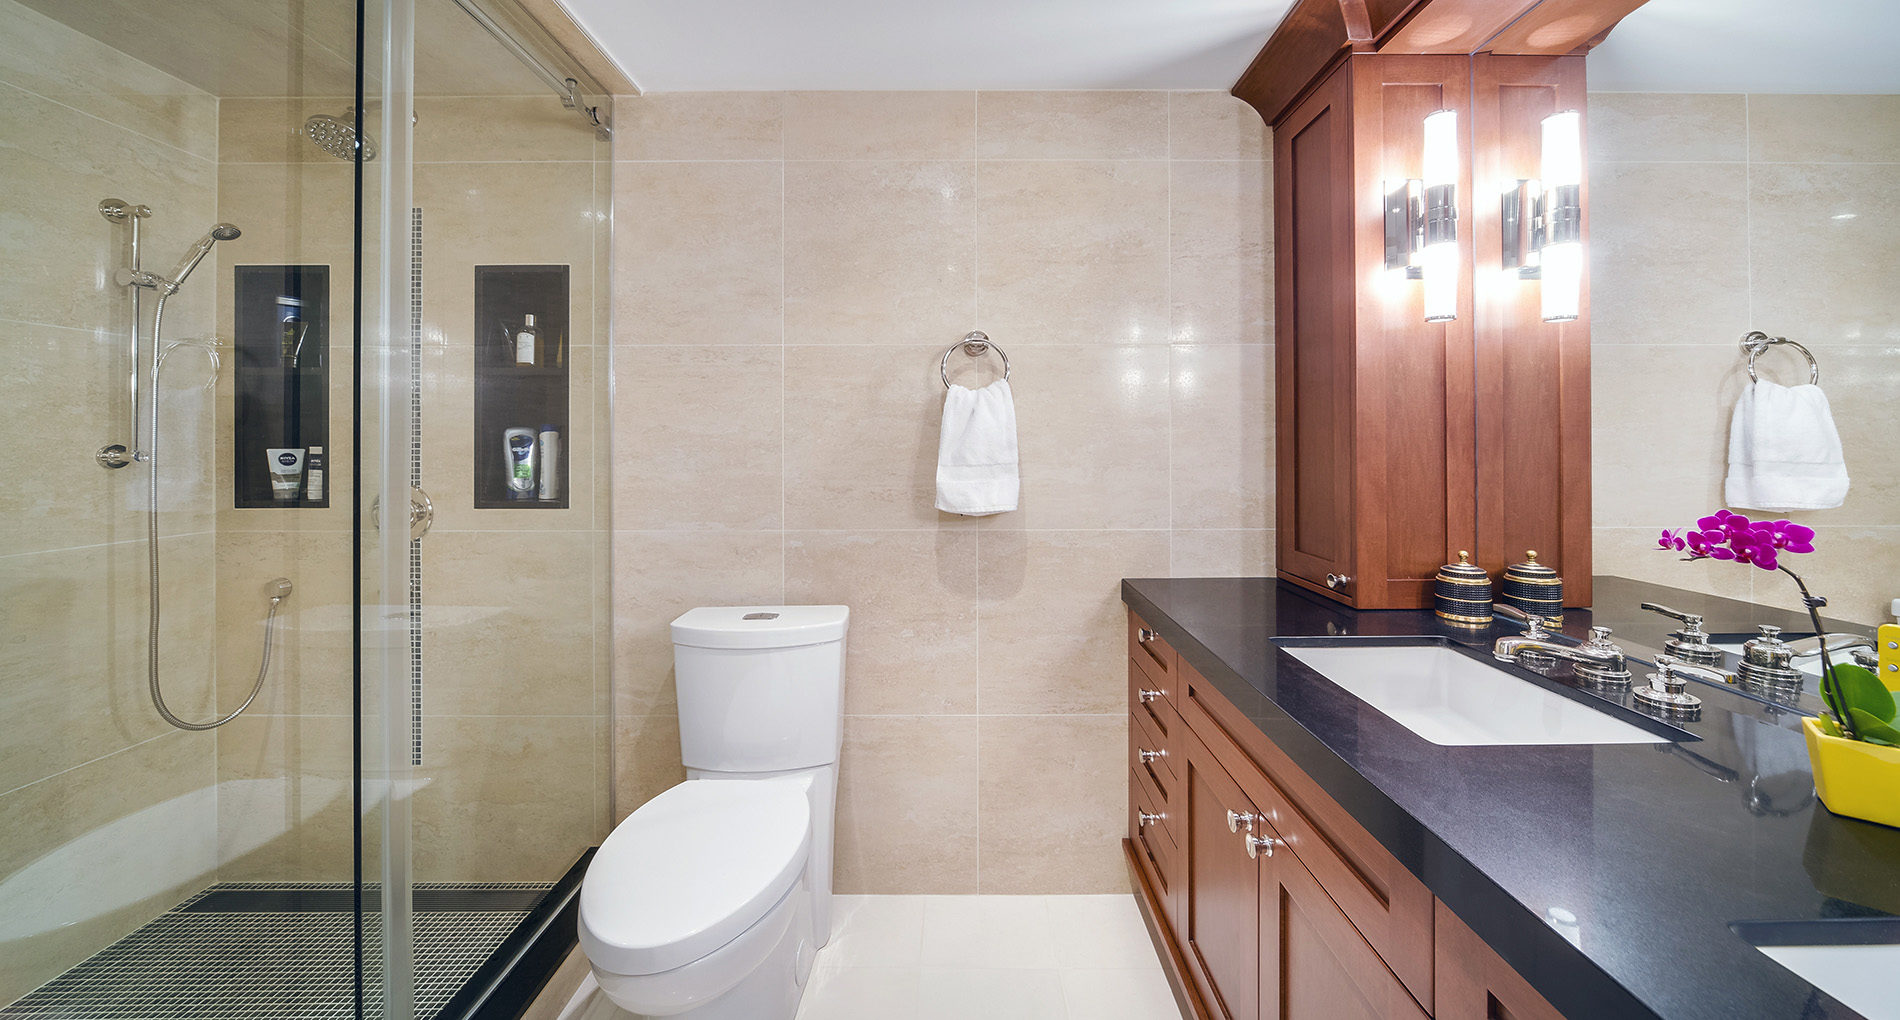 Bathroom Renovations & Design in Toronto | Alair Homes Toronto